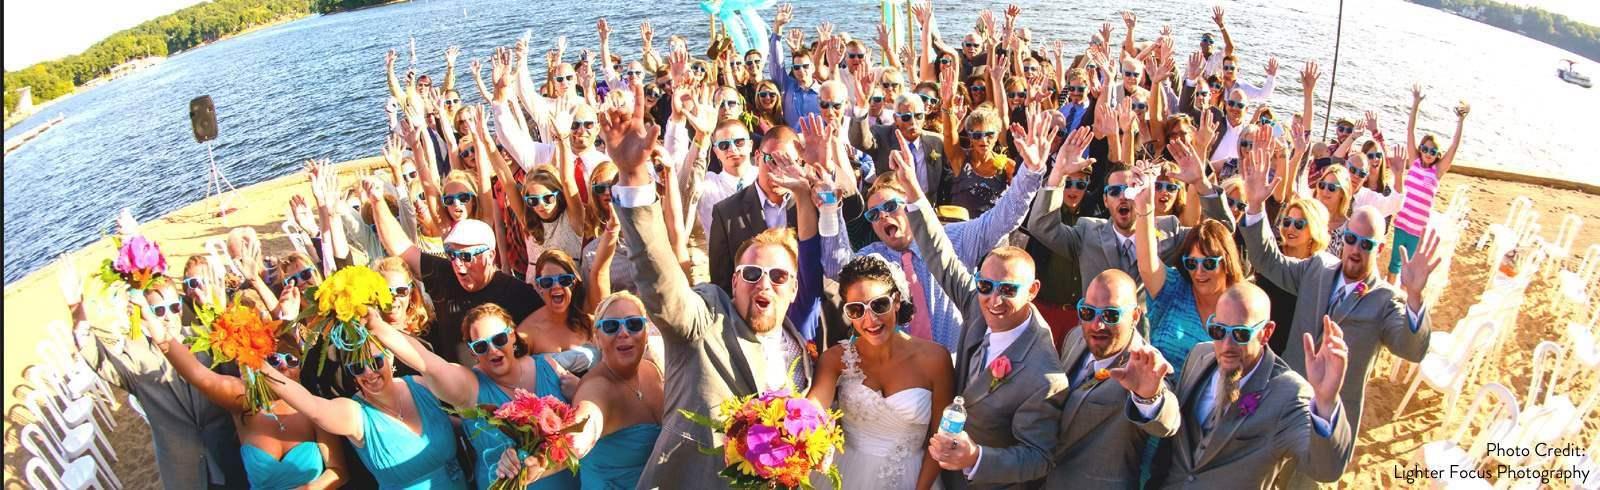 Wedding of Margaritaville Lake Resort Lake of the Ozarks Osage Beach Missouri